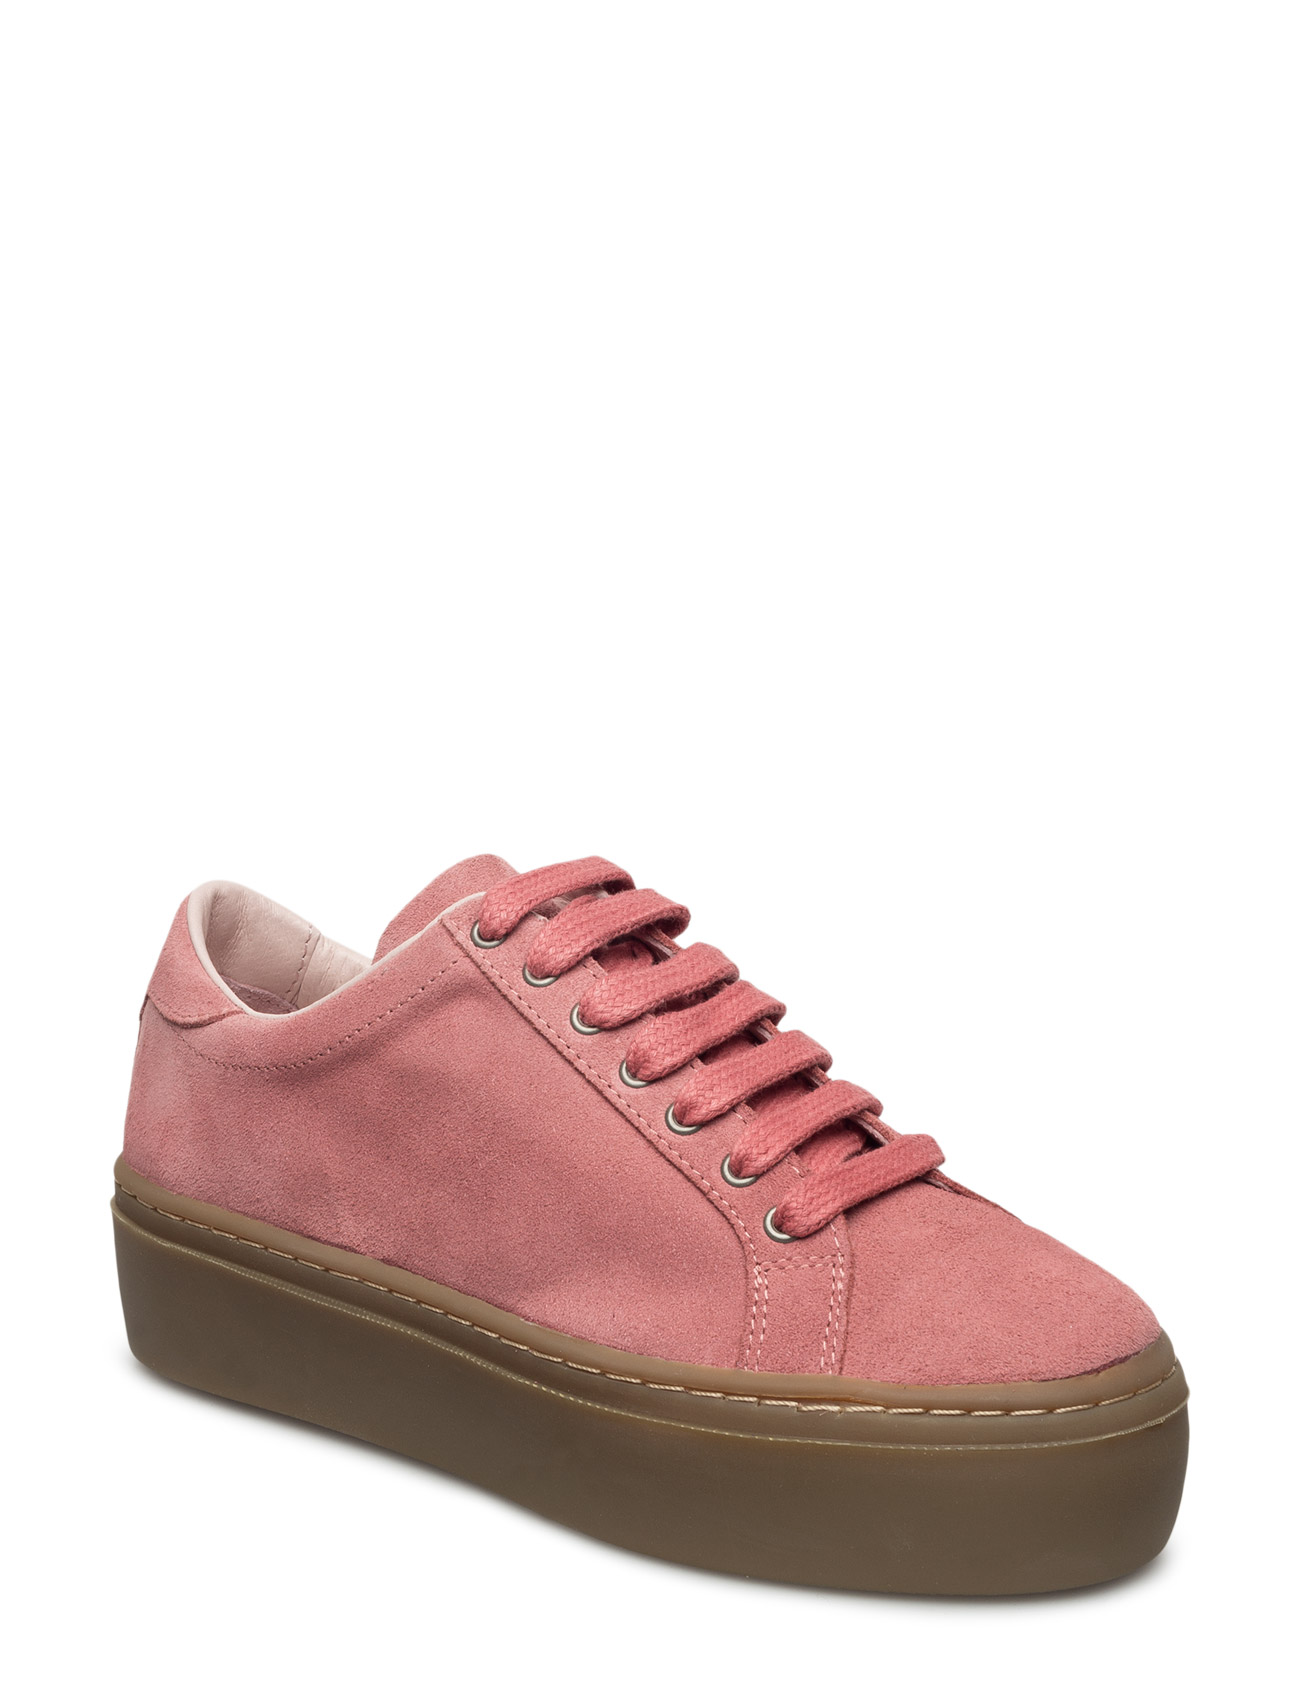 Rica Shoes Ms17 Gestuz Sneakers til Damer i